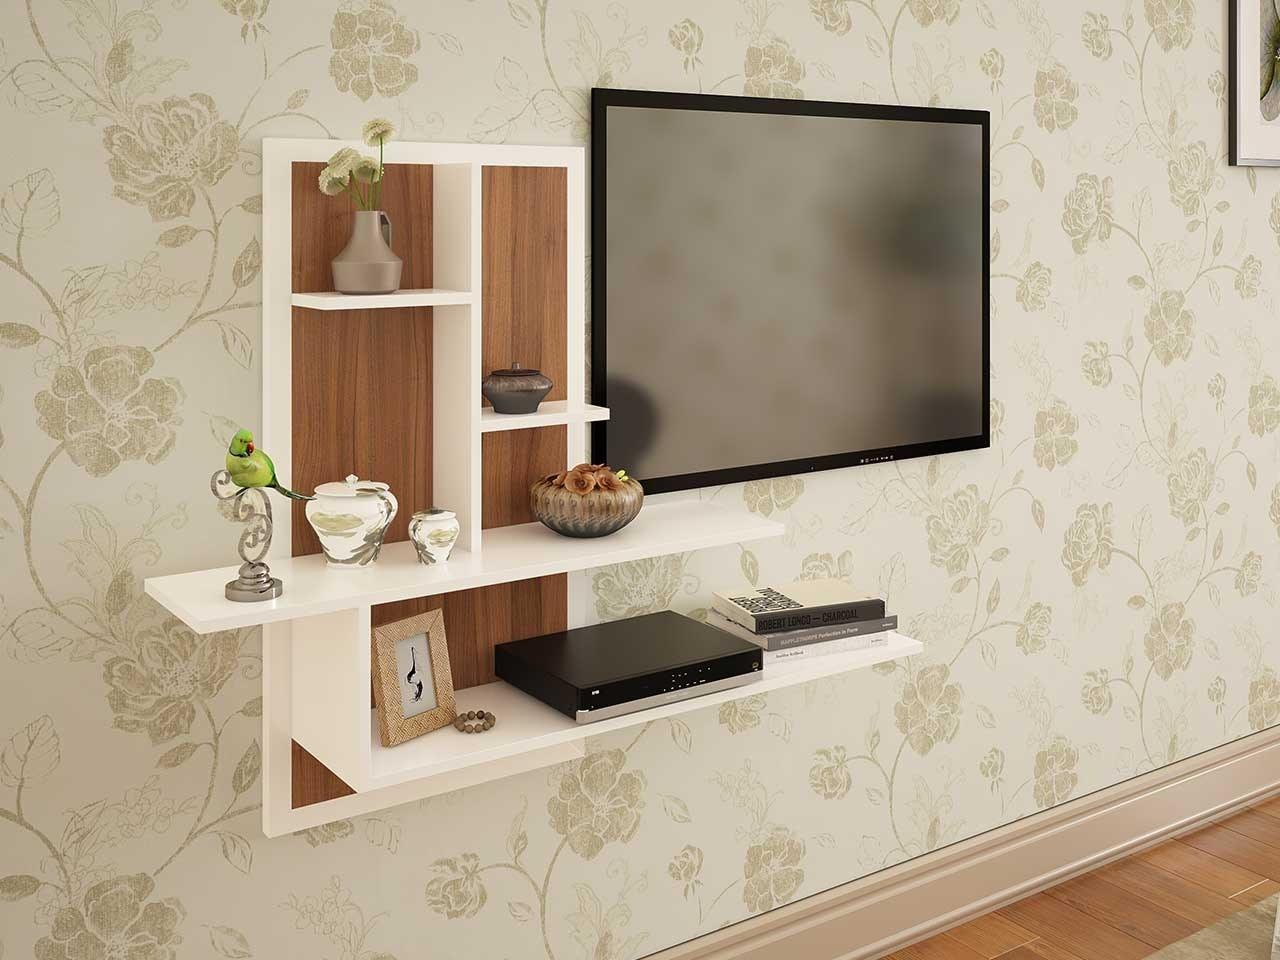 شلف دیواری تلویزیون مدل DT 108